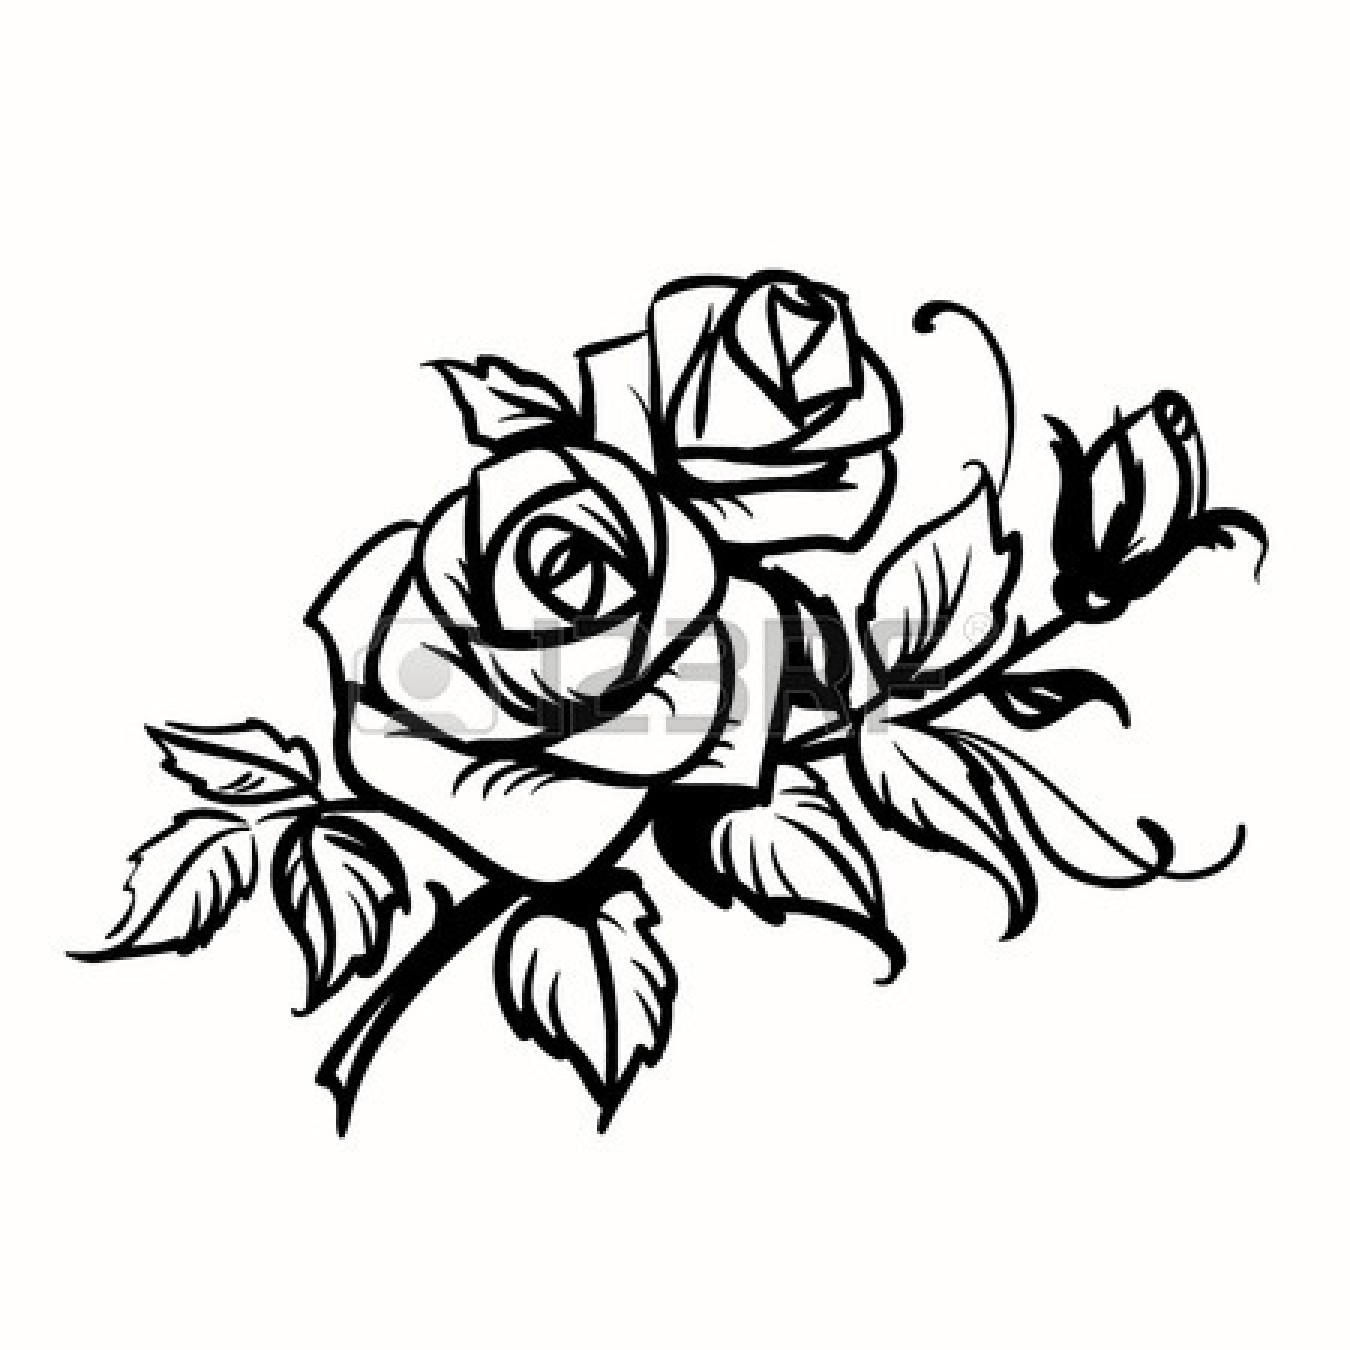 1350x1350 Knumathise Rose Clip Art Outline Images